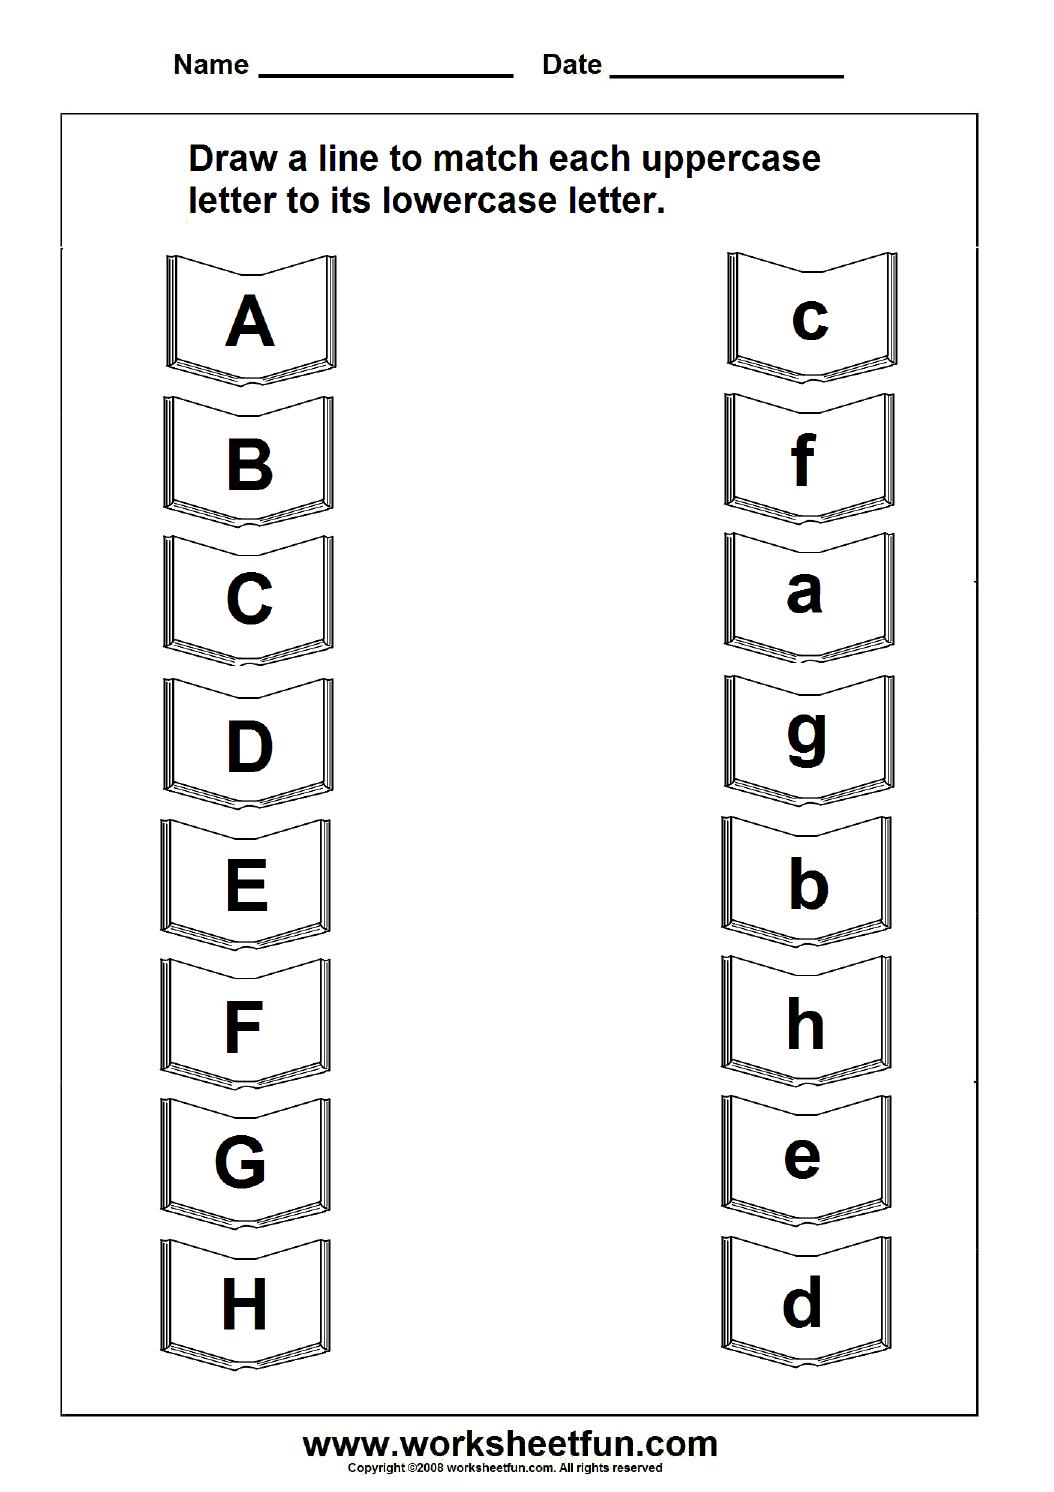 Uppercase Lowercase Letter   Education   Letter Worksheets - Free Printable Alphabet Letters Upper And Lower Case